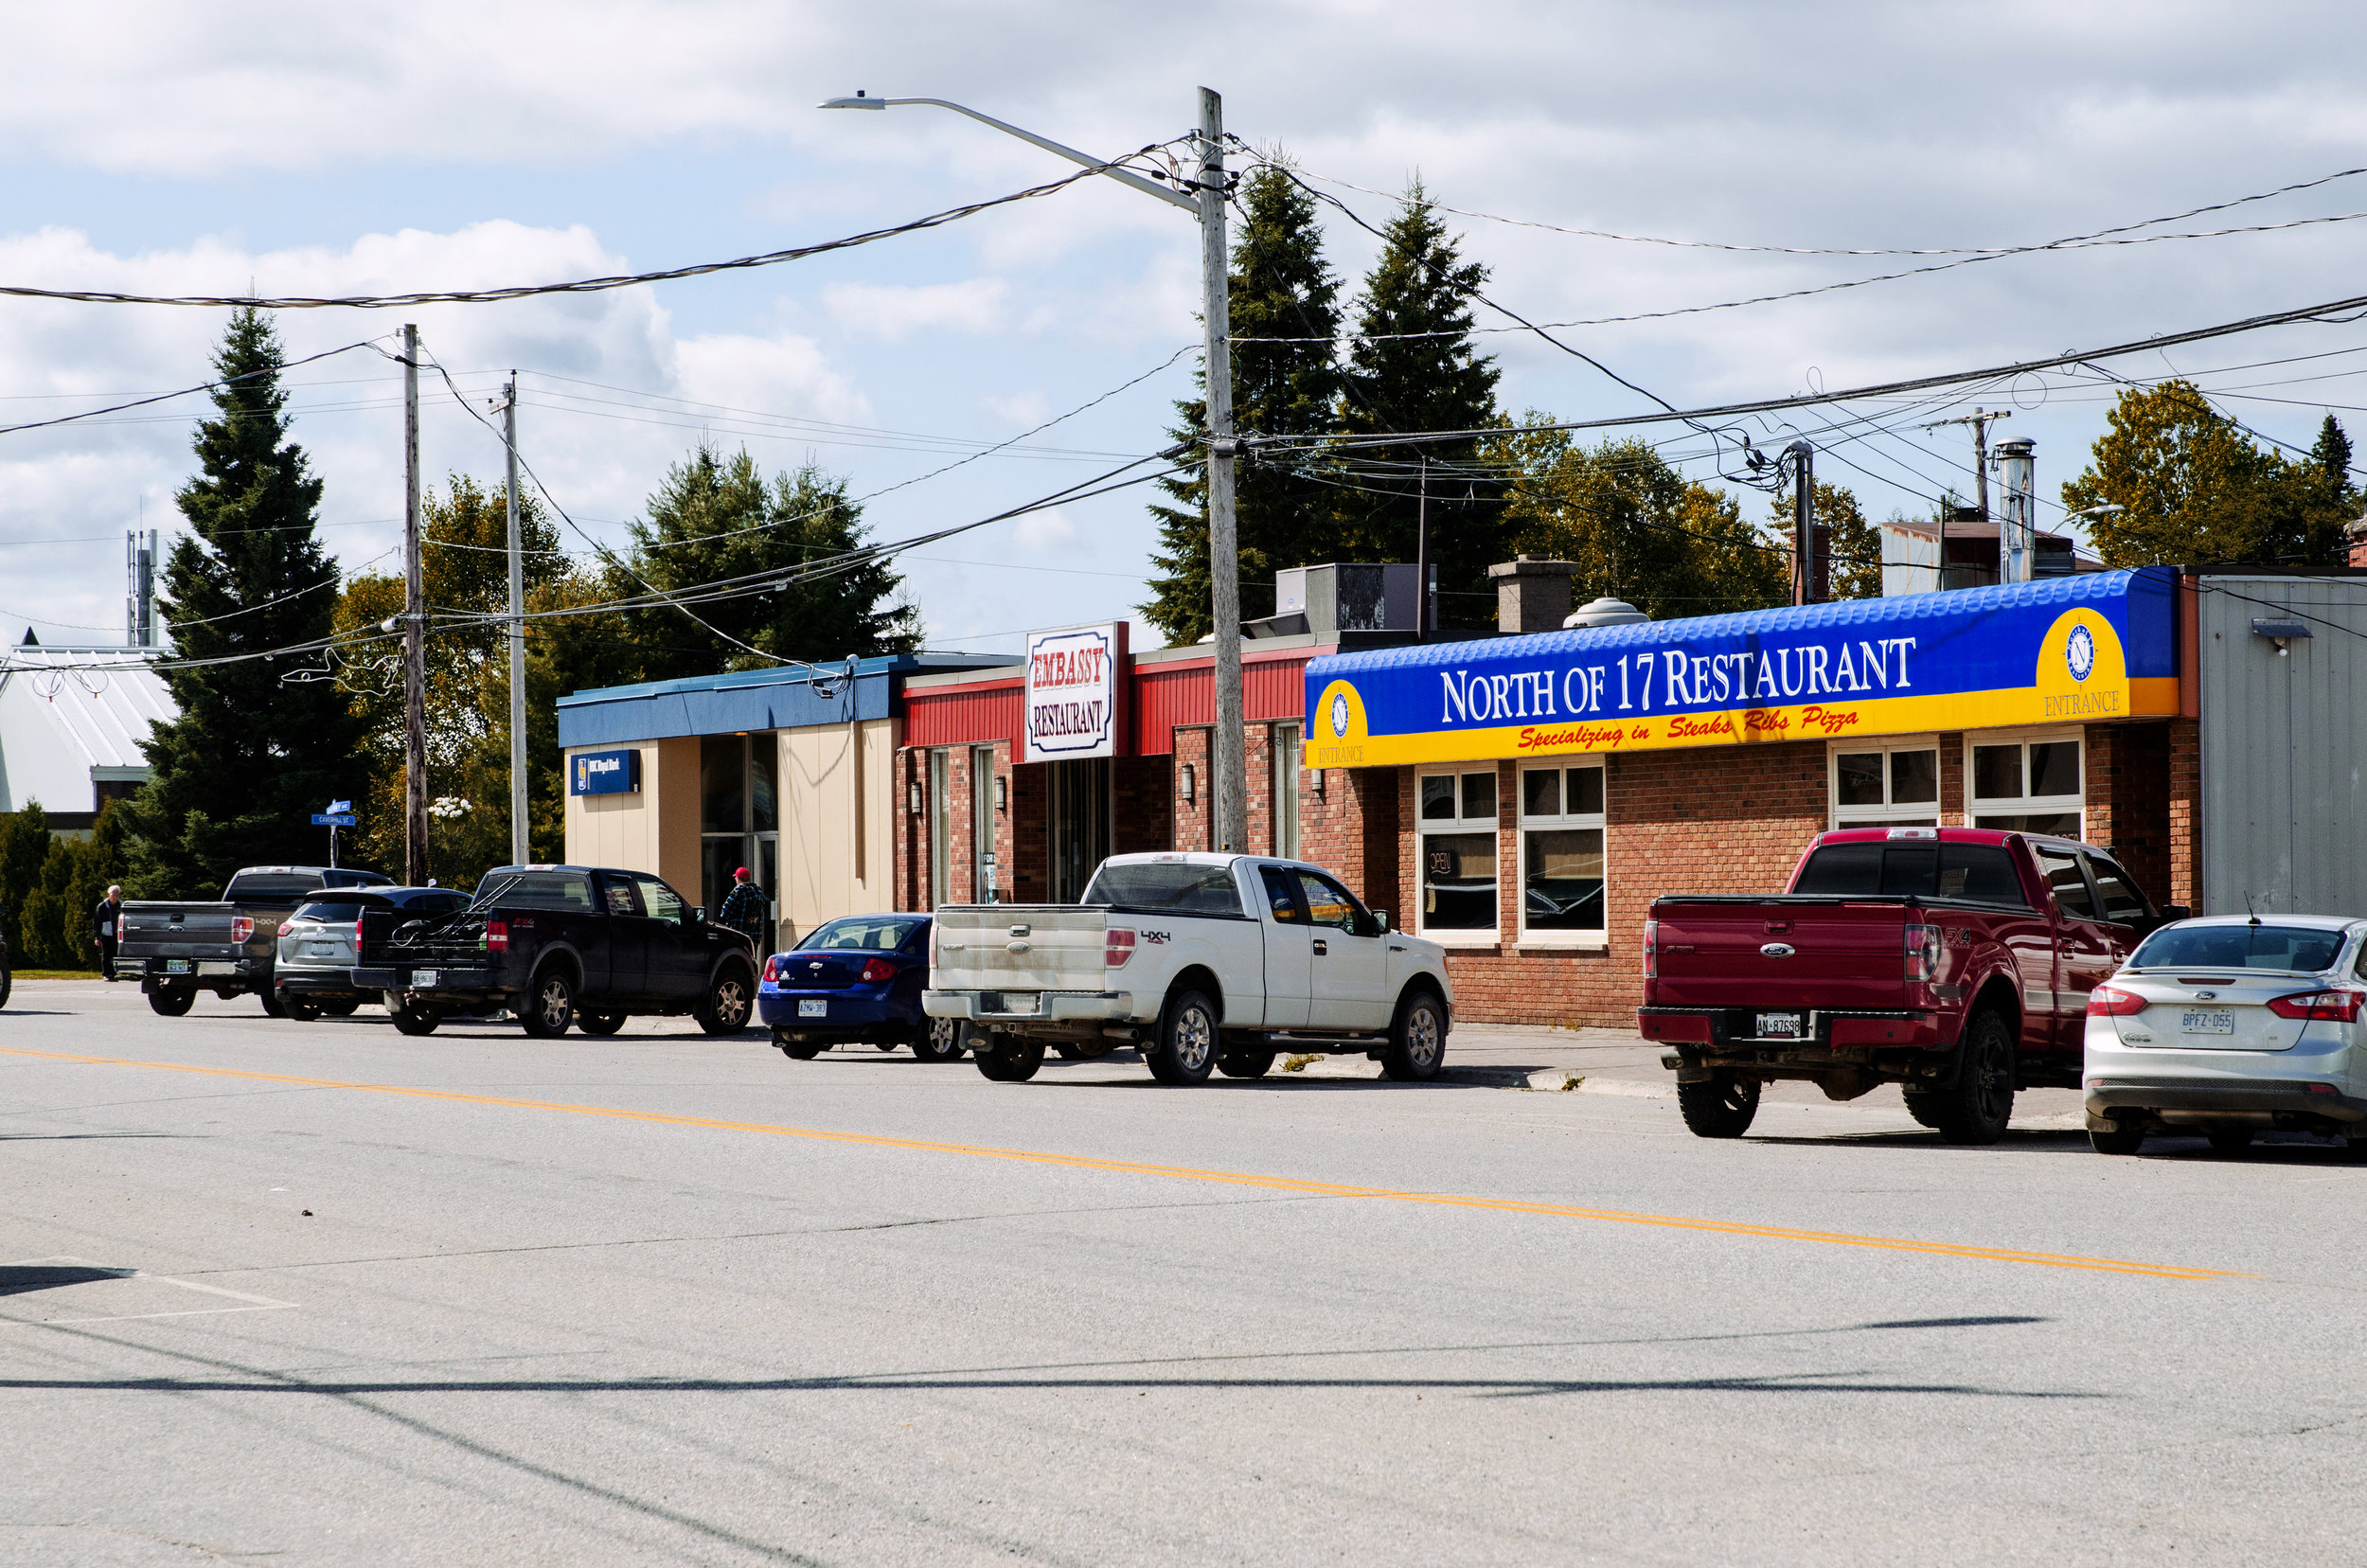 Jenkins, Cheyenne. North of 17. 2017. Digital Photography. Wawa, Ontario